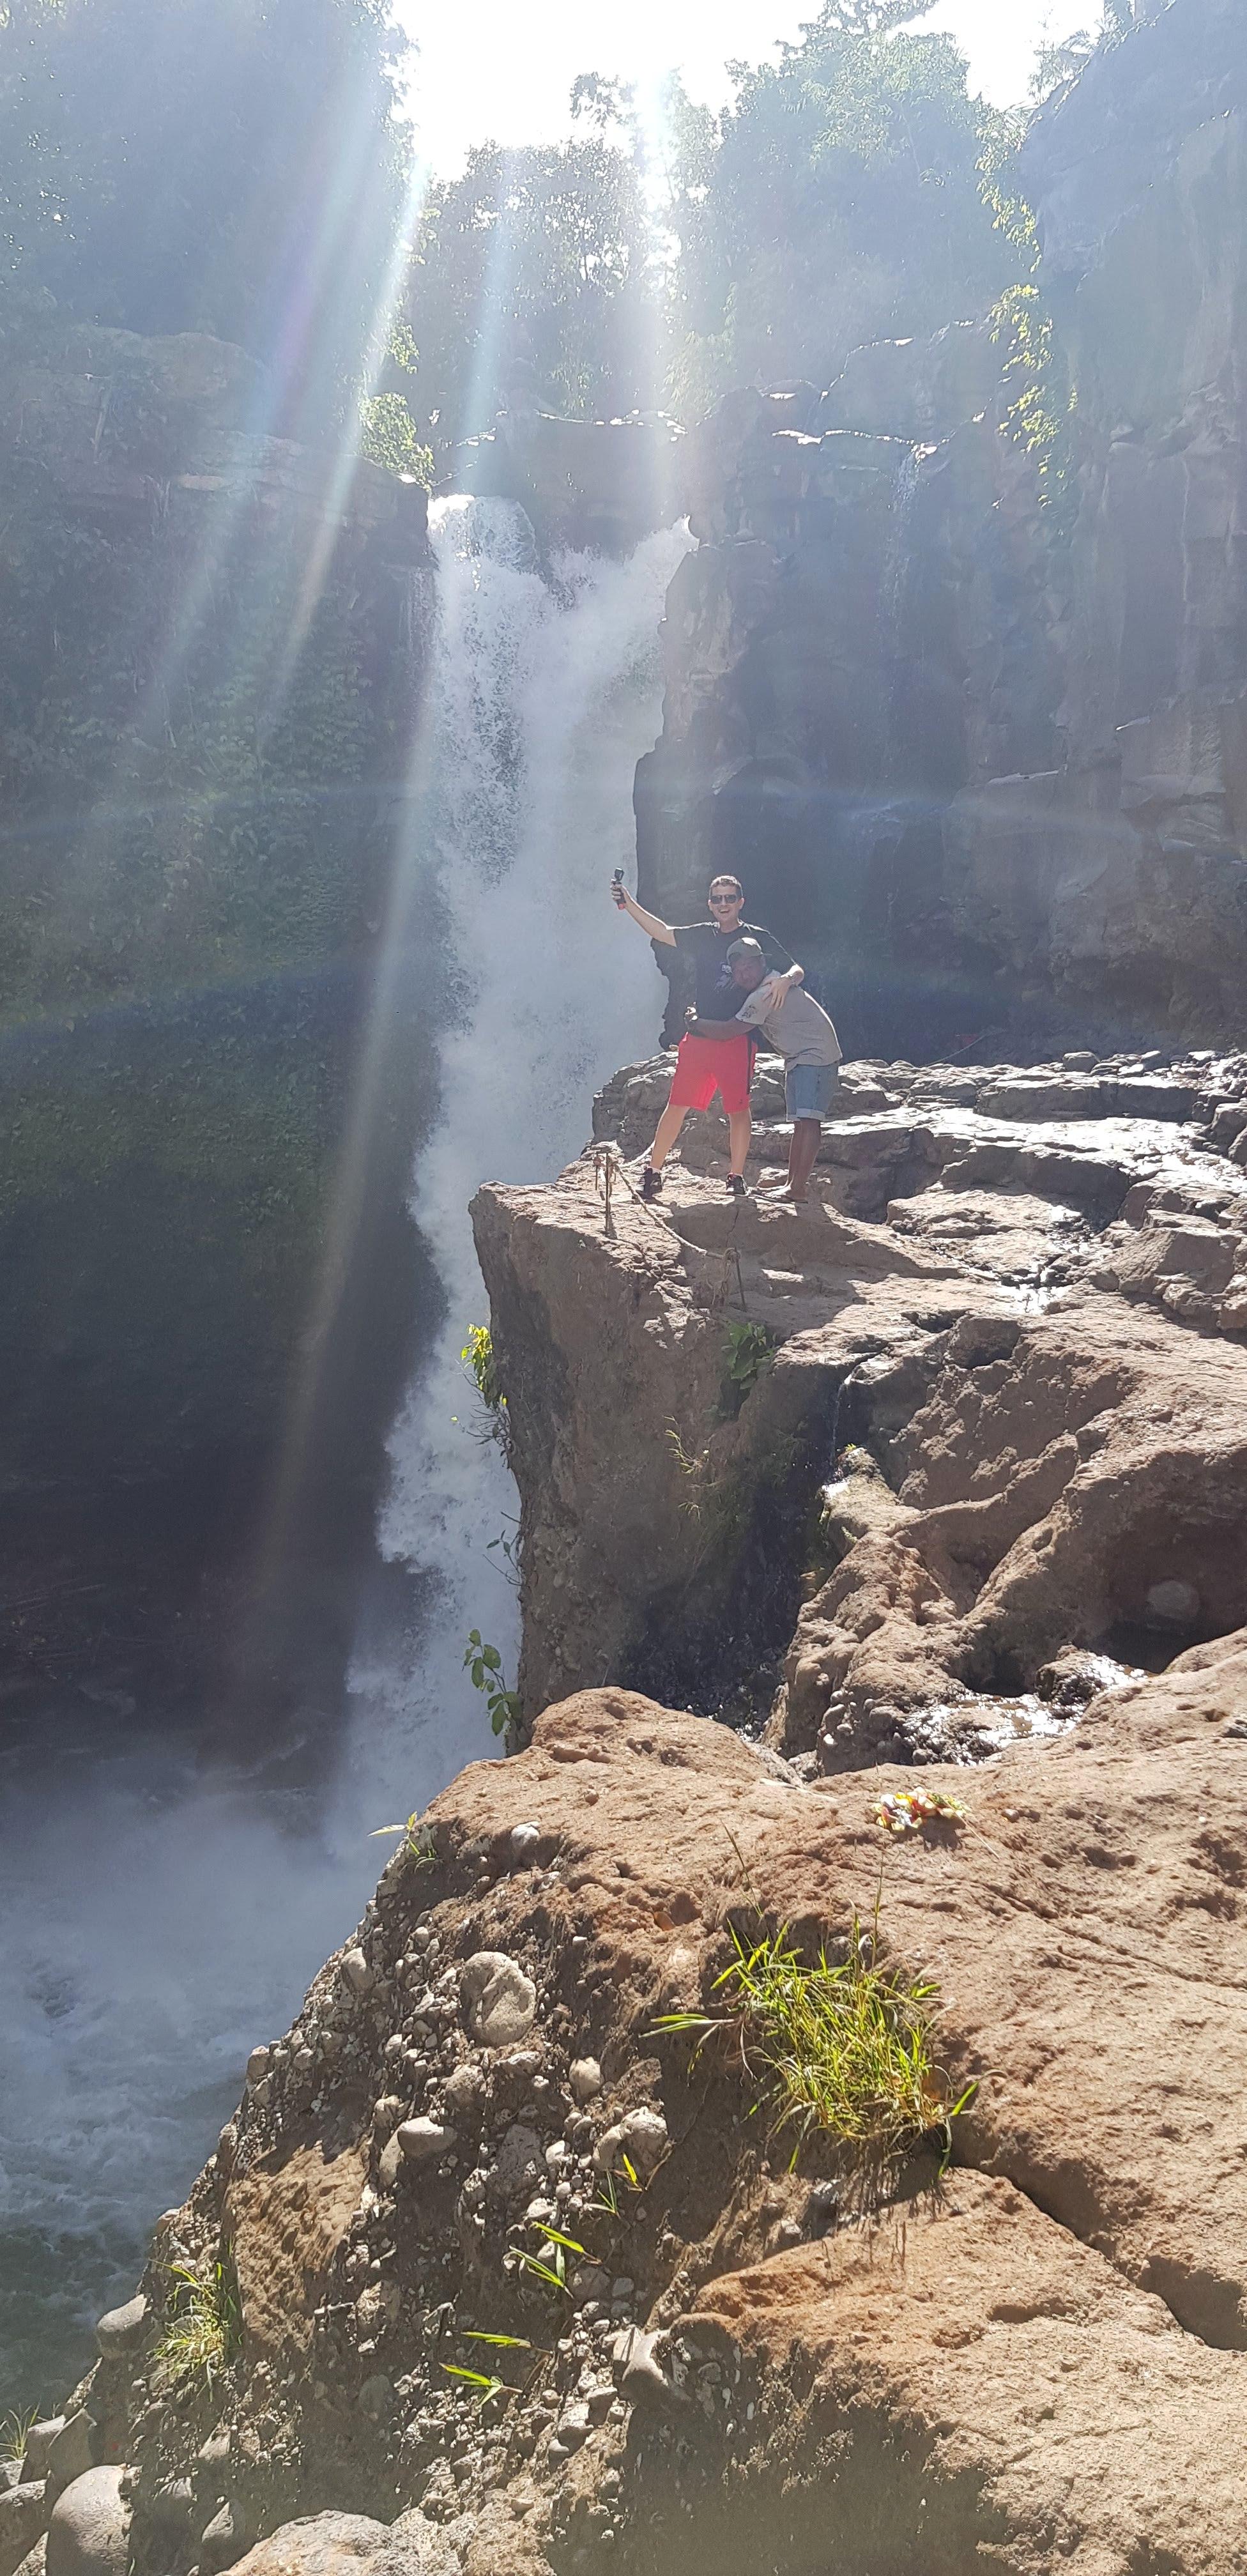 travel light up life business blog bali waterfall culture